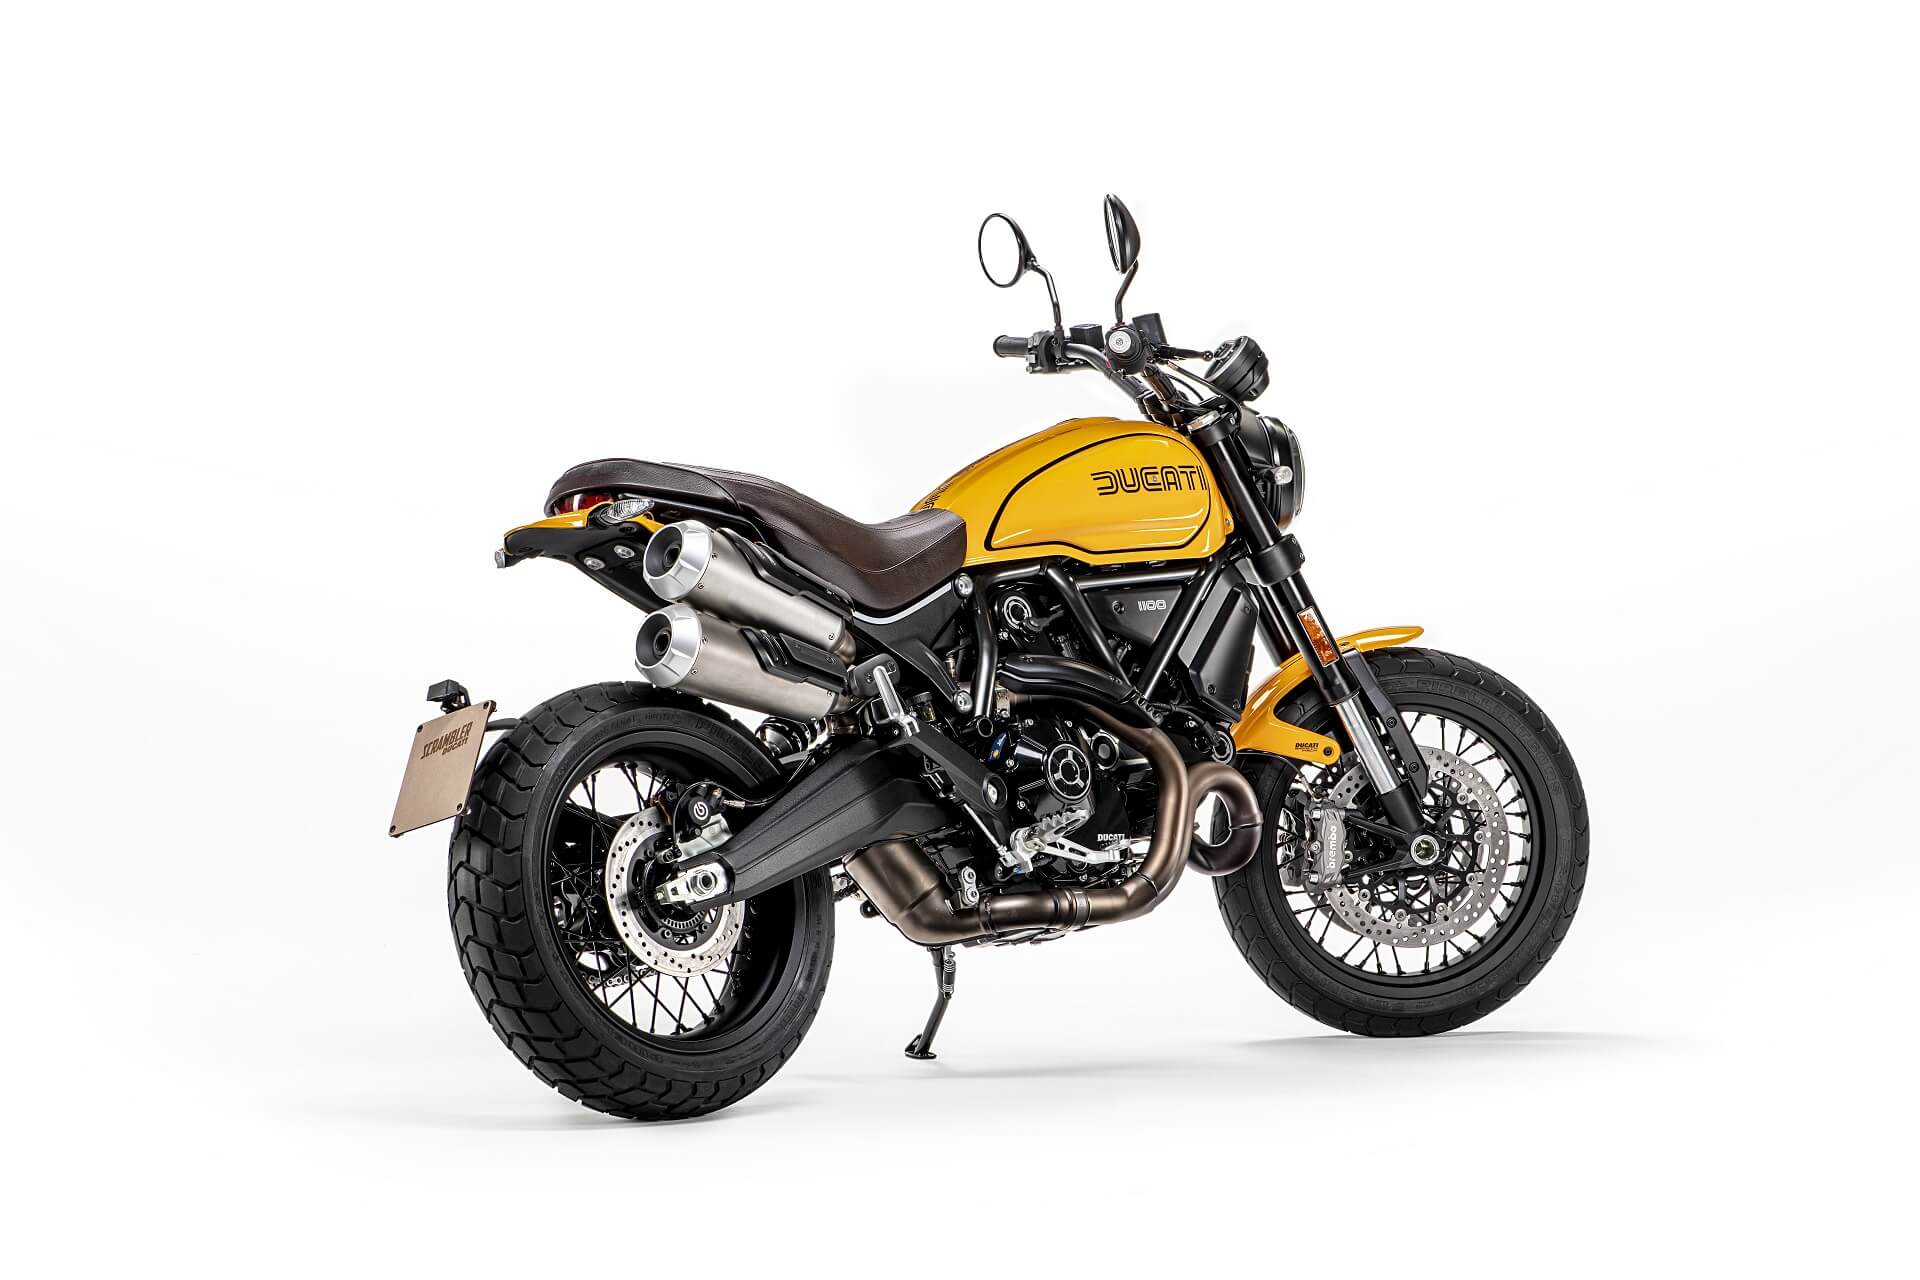 Ducati Scrambler 1100 TributePro